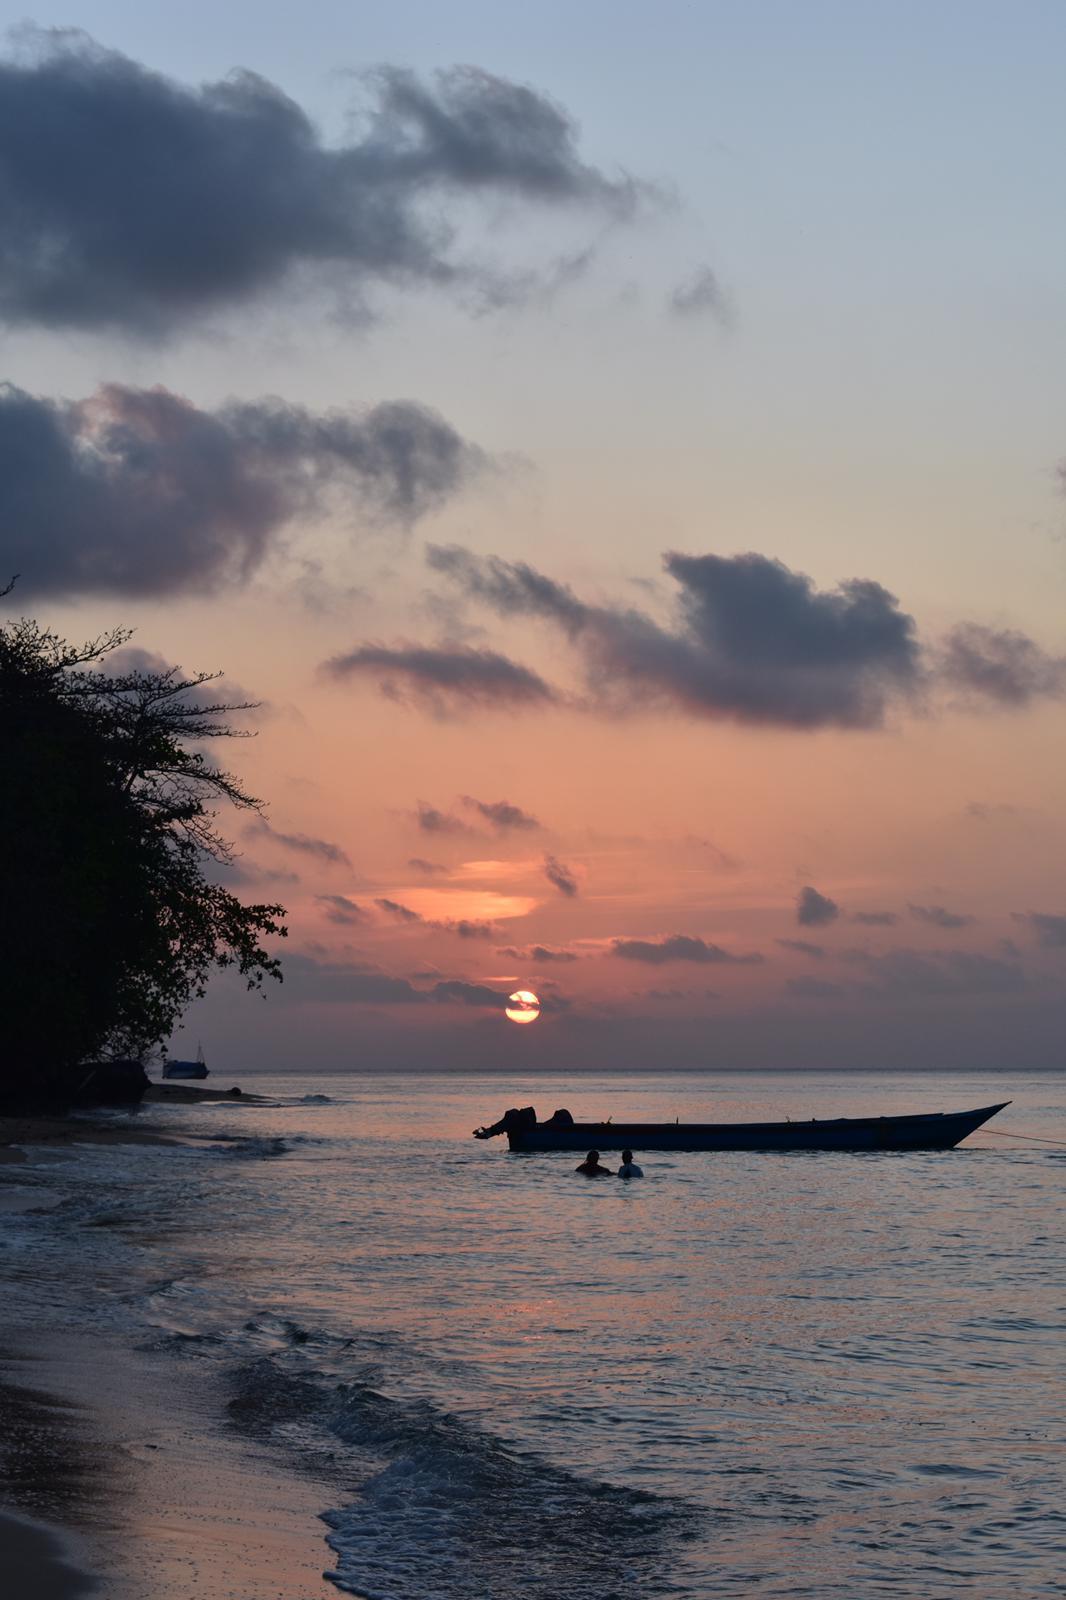 Pulau Hatta, Banda eilanden